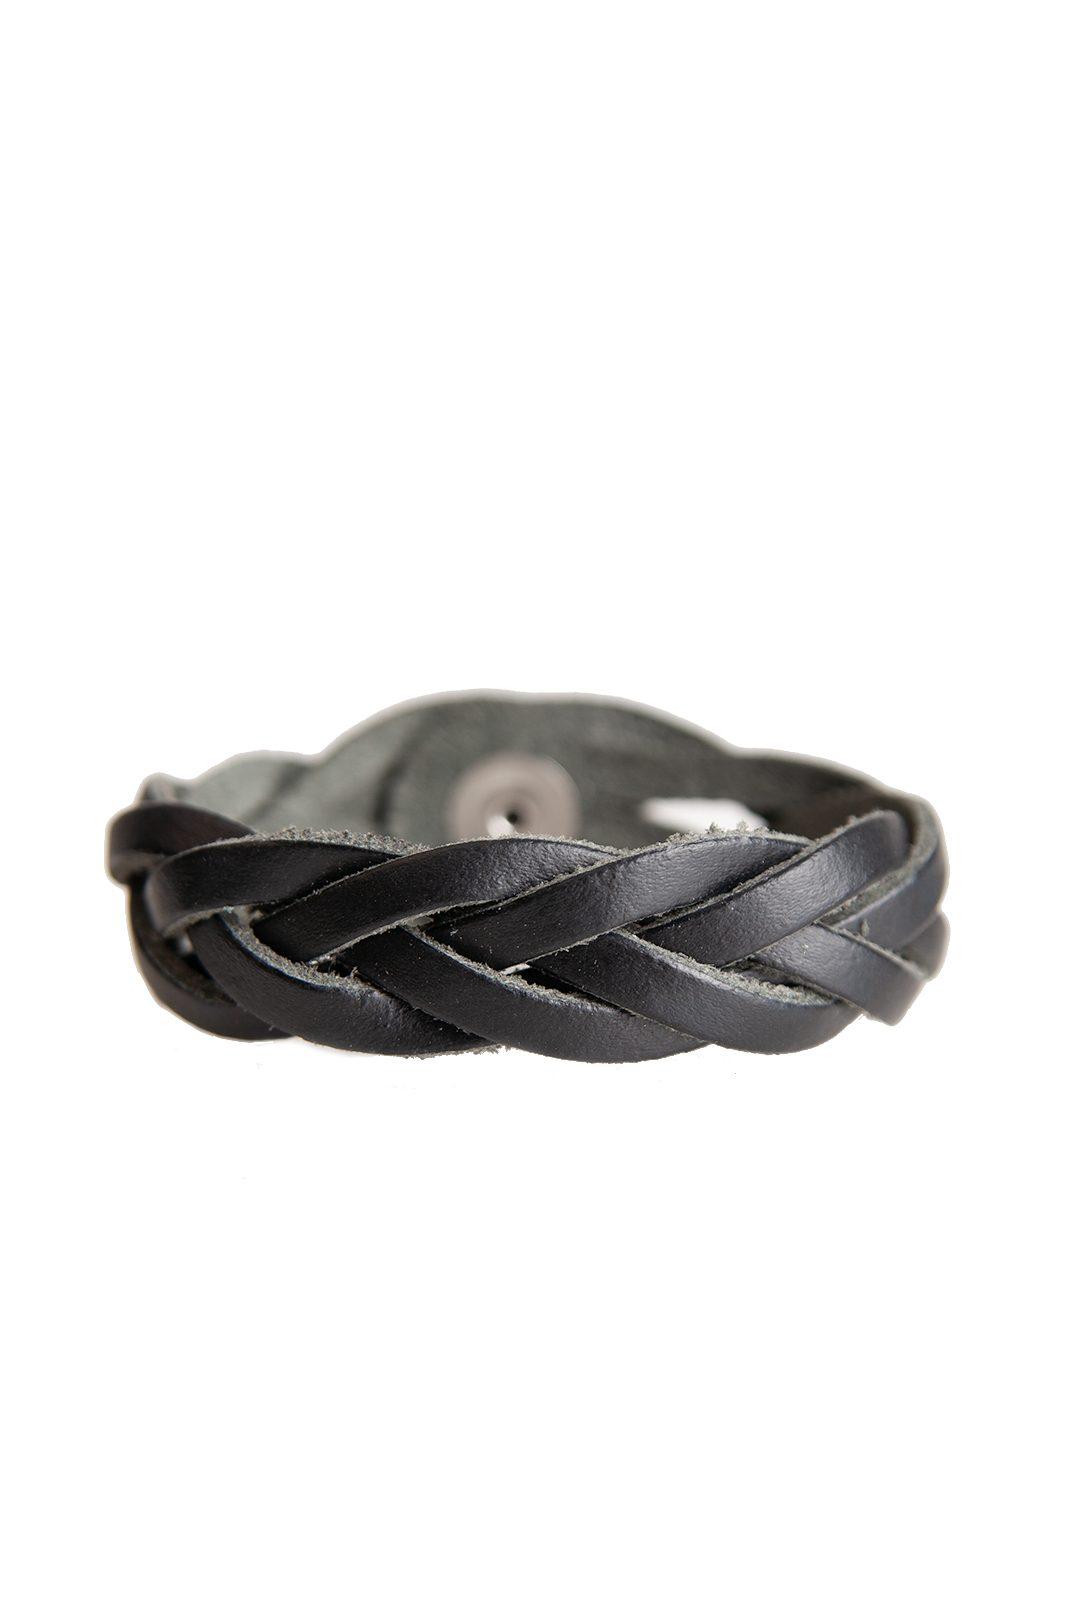 Black Weaved Leather Wristband